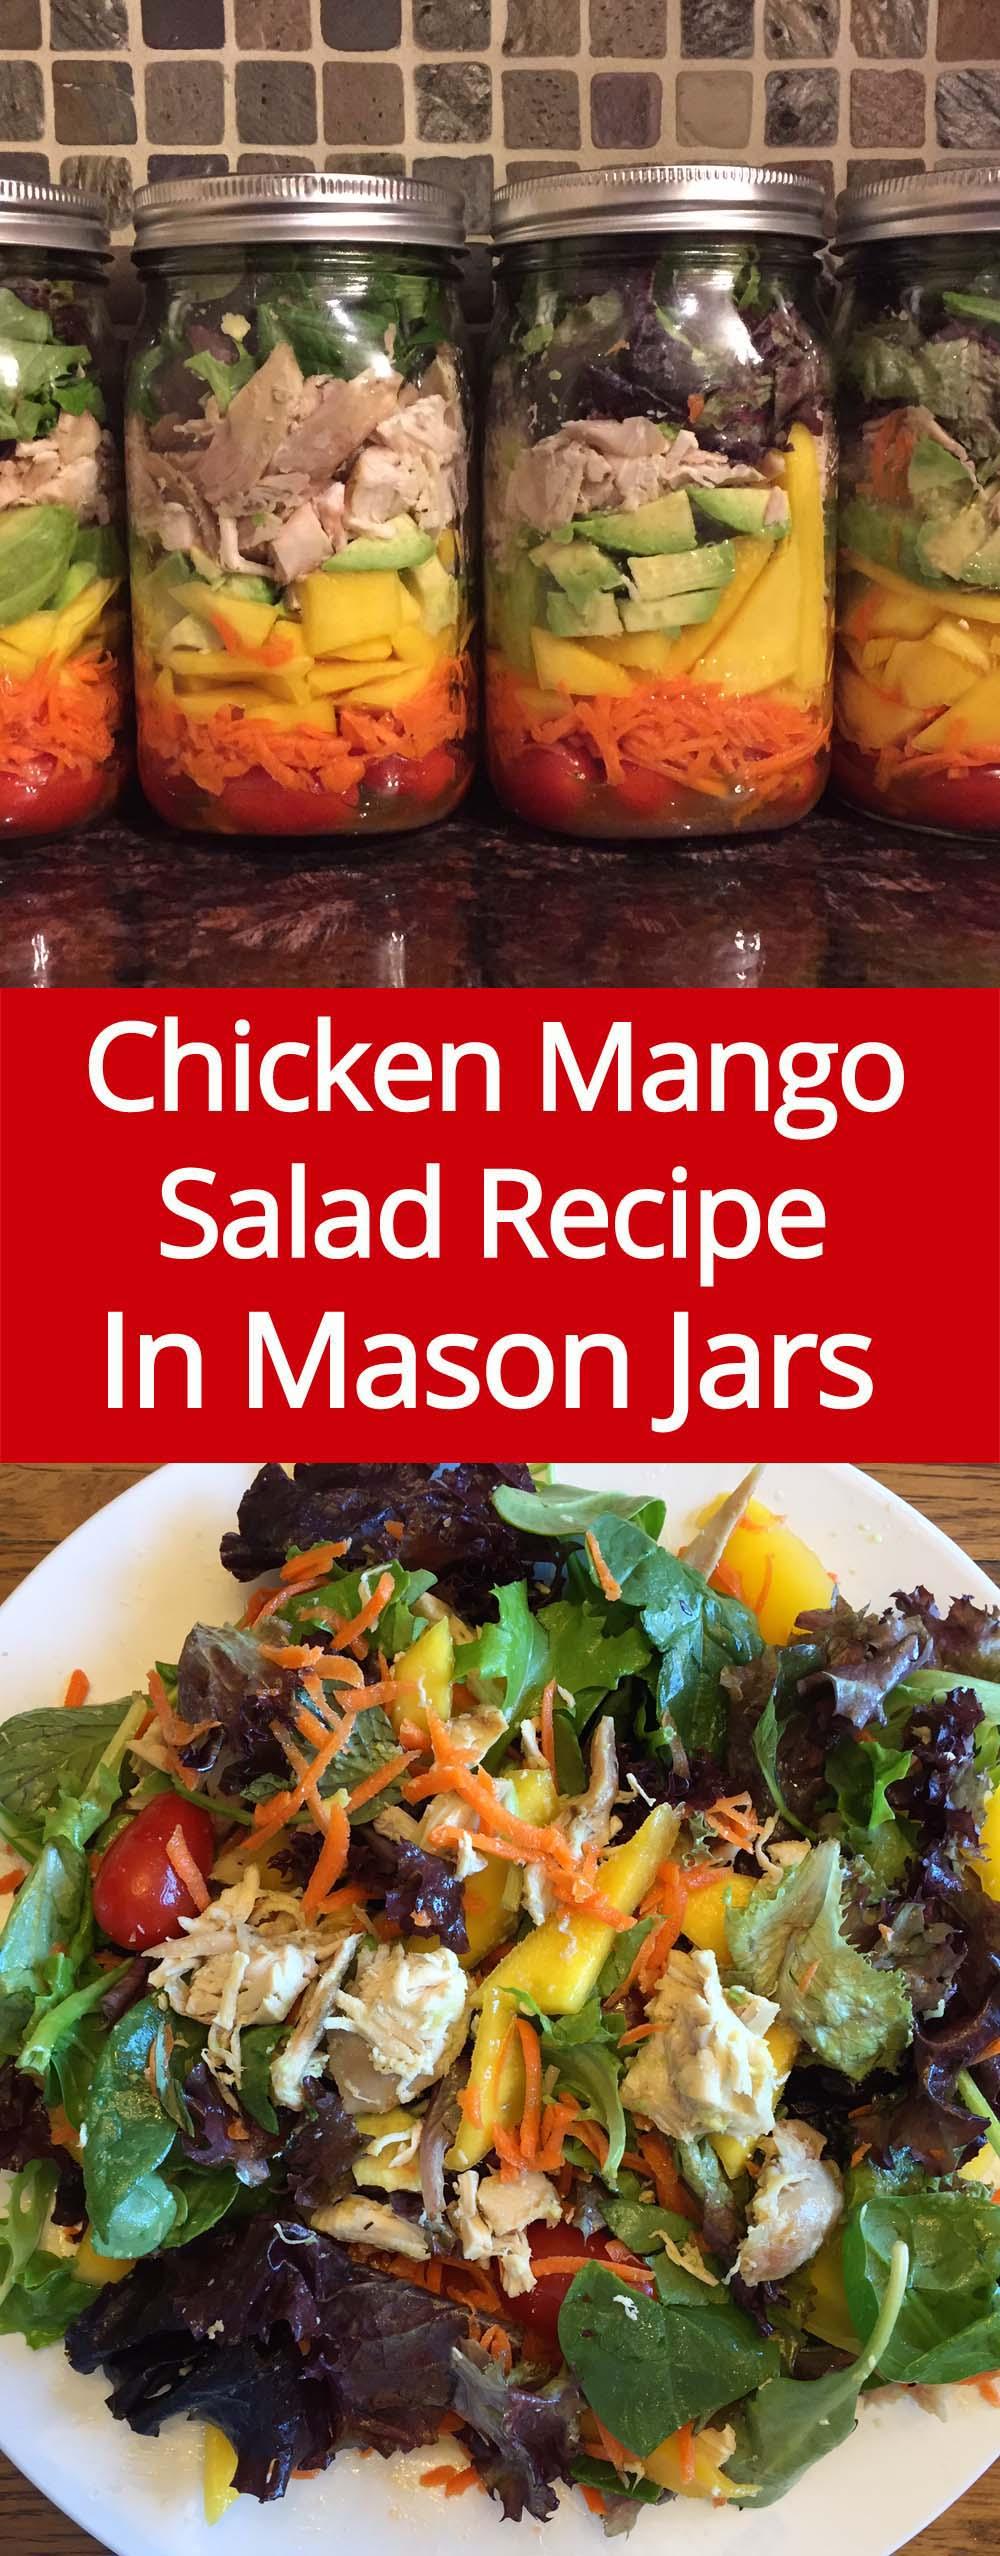 Chicken Mango Mason Jar Salad Recipe - these mason jar salads stay fresh for 5 days!  Genius idea, must try this!